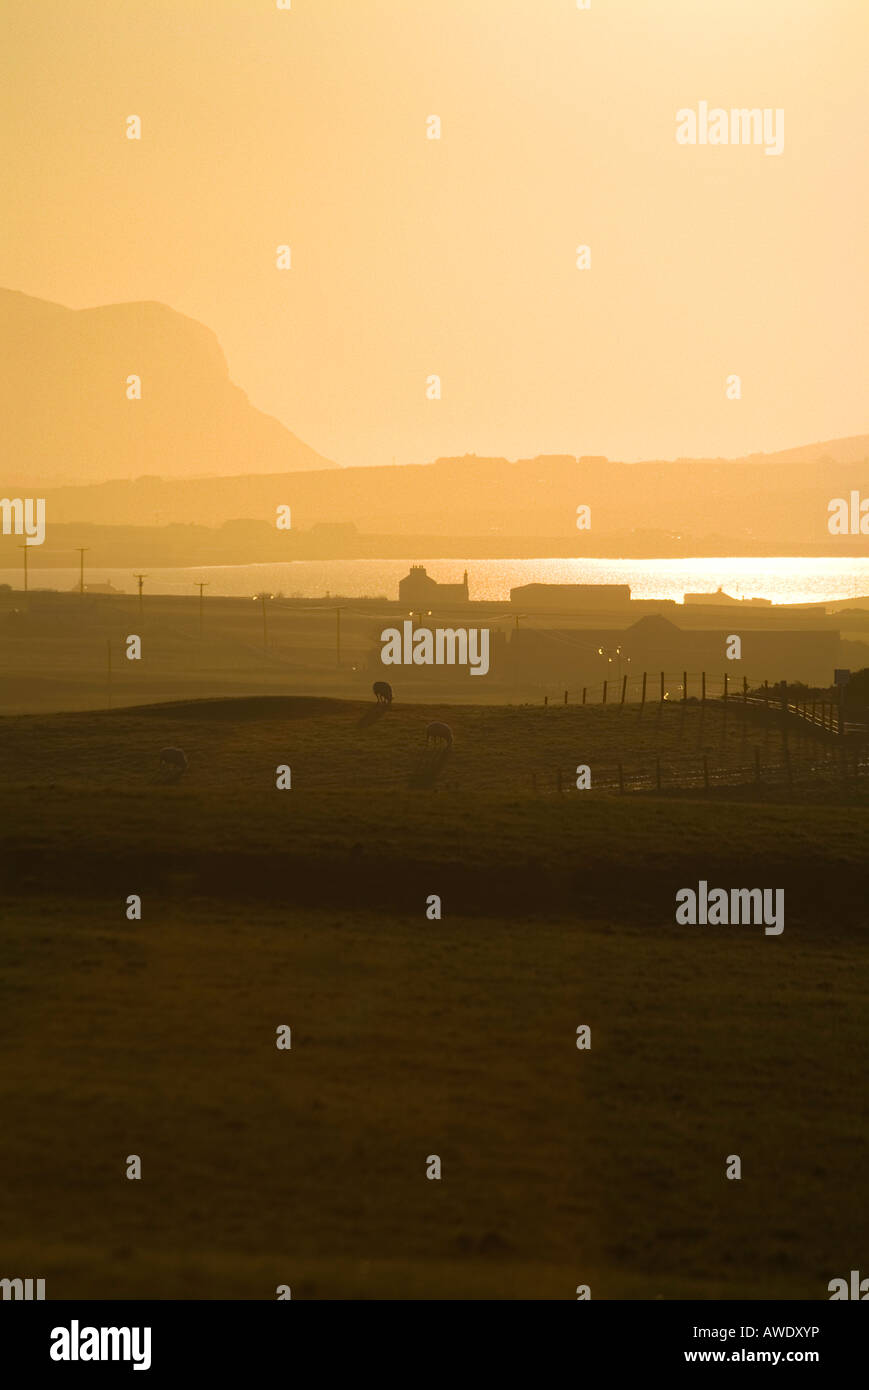 dh Loch of Harray HARRAY ORKNEY Sheep in field orange dusk sunset Stock Photo